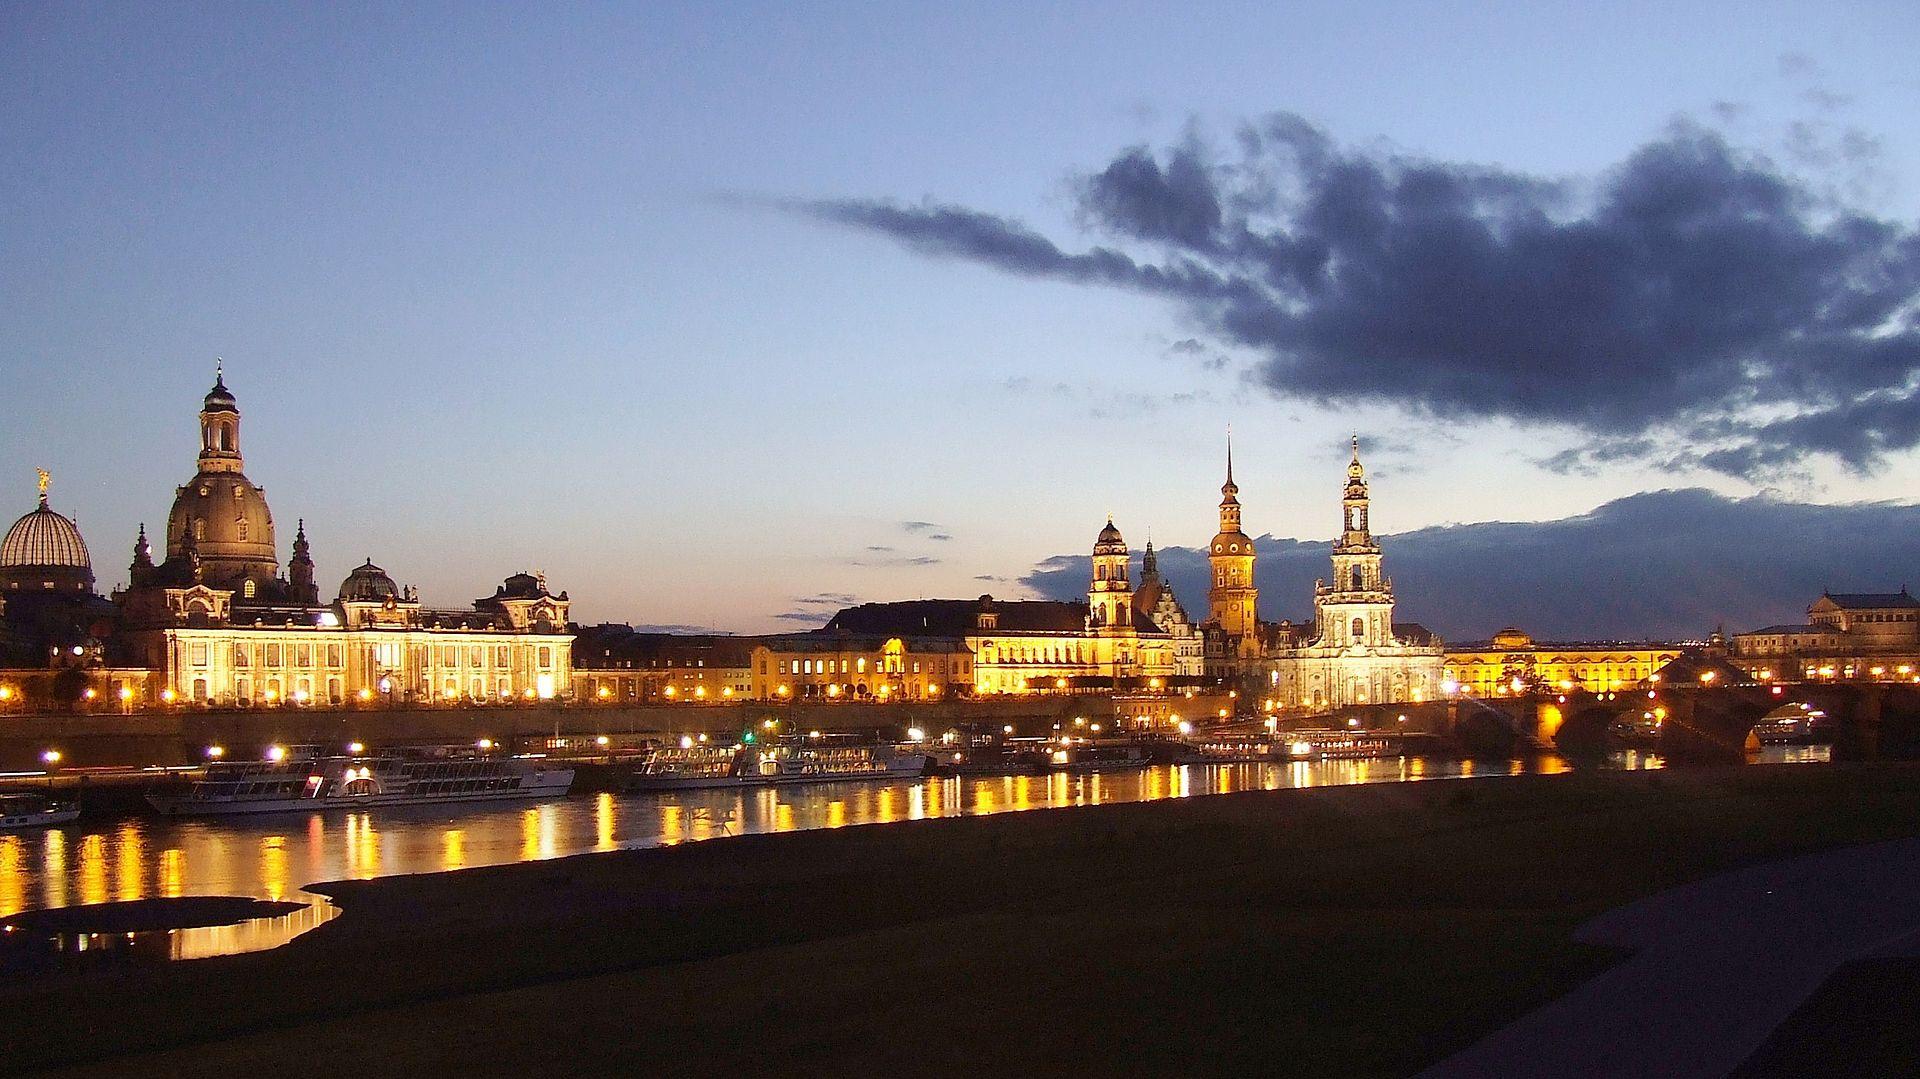 Dresden -  Frühlingshafte Pfingsten vom 19.05. - 22.05.2018